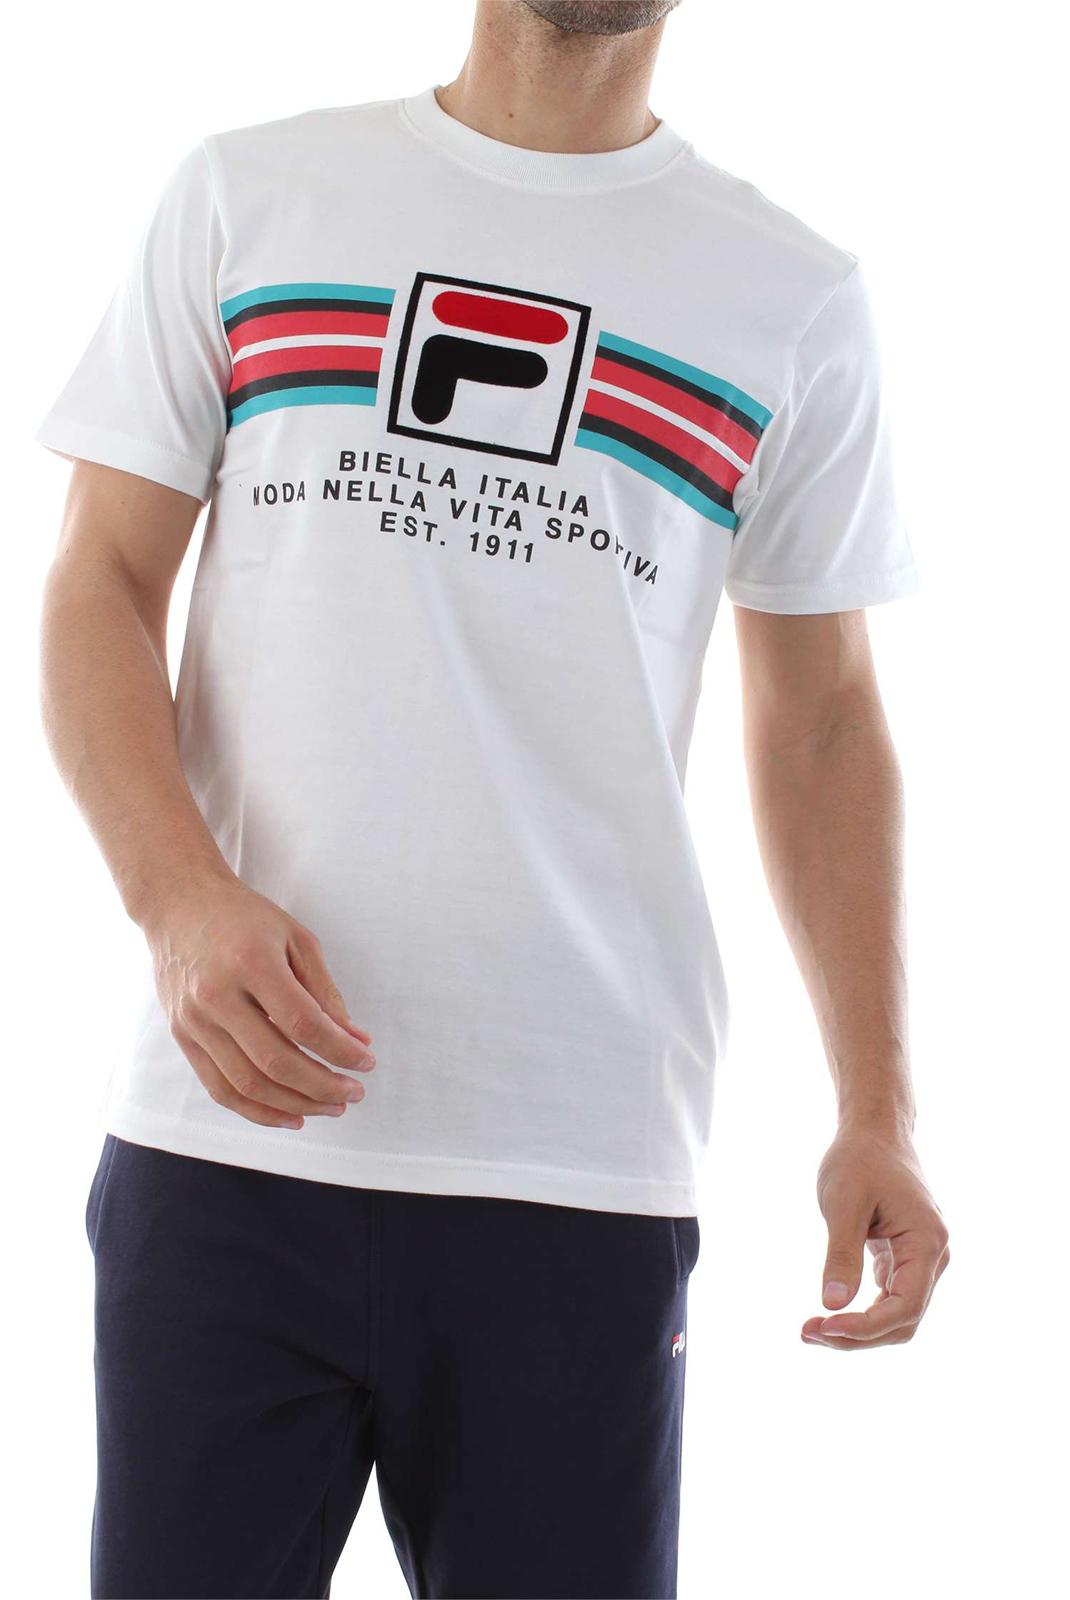 Tee-shirts  Fila 684499 mercedes 1 WHITE